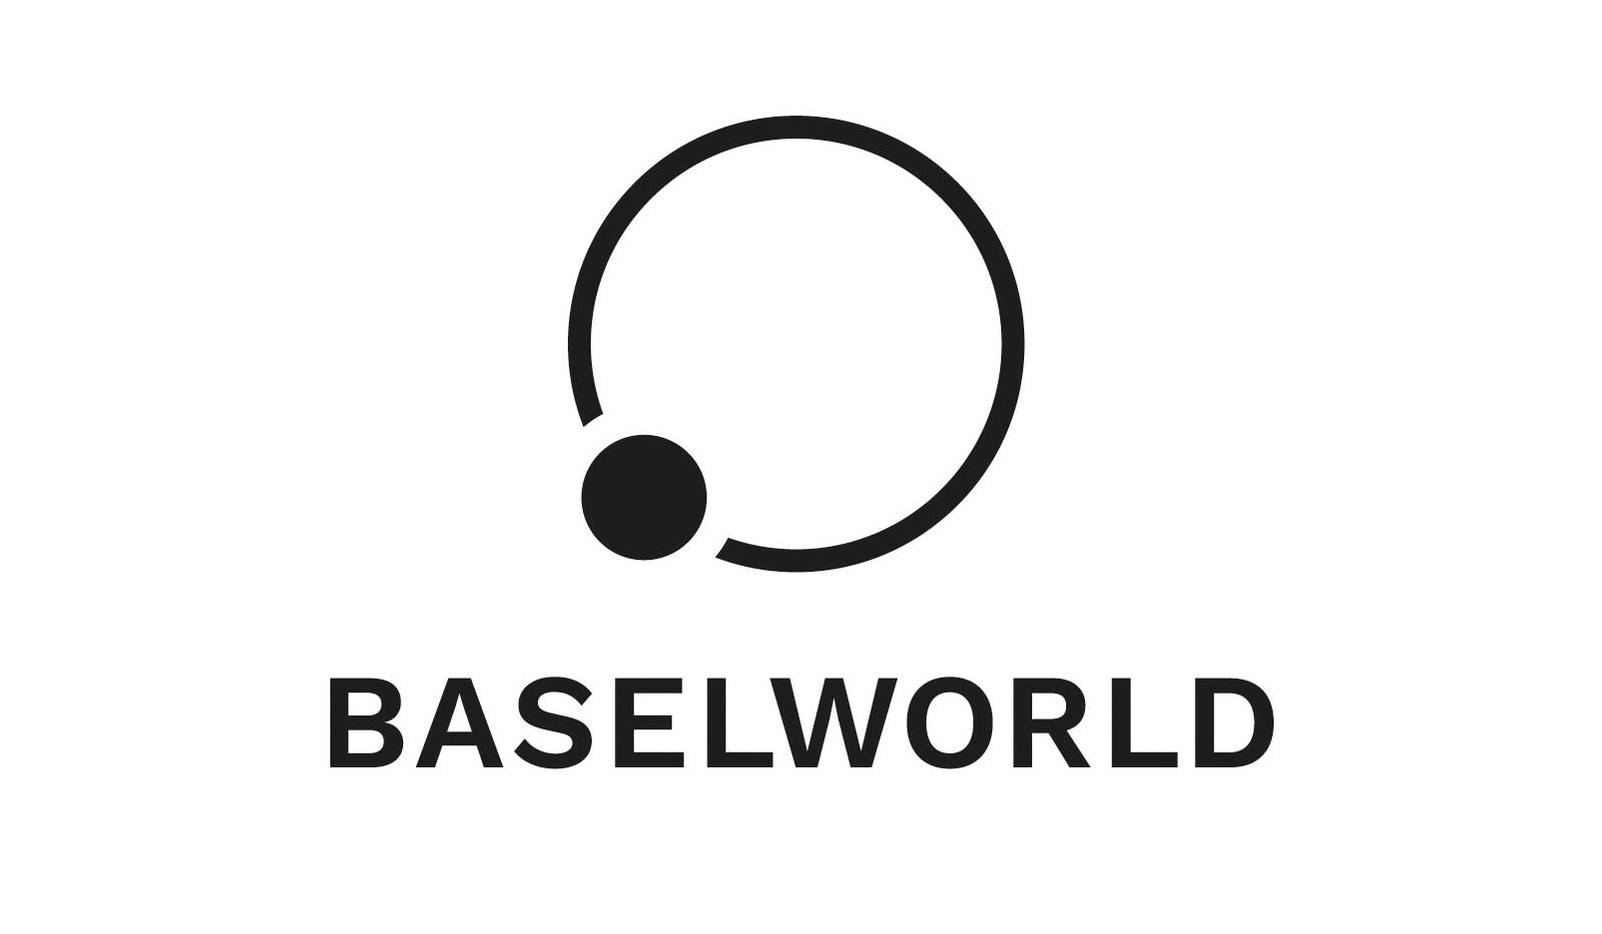 Nuevo logo de Baselworld